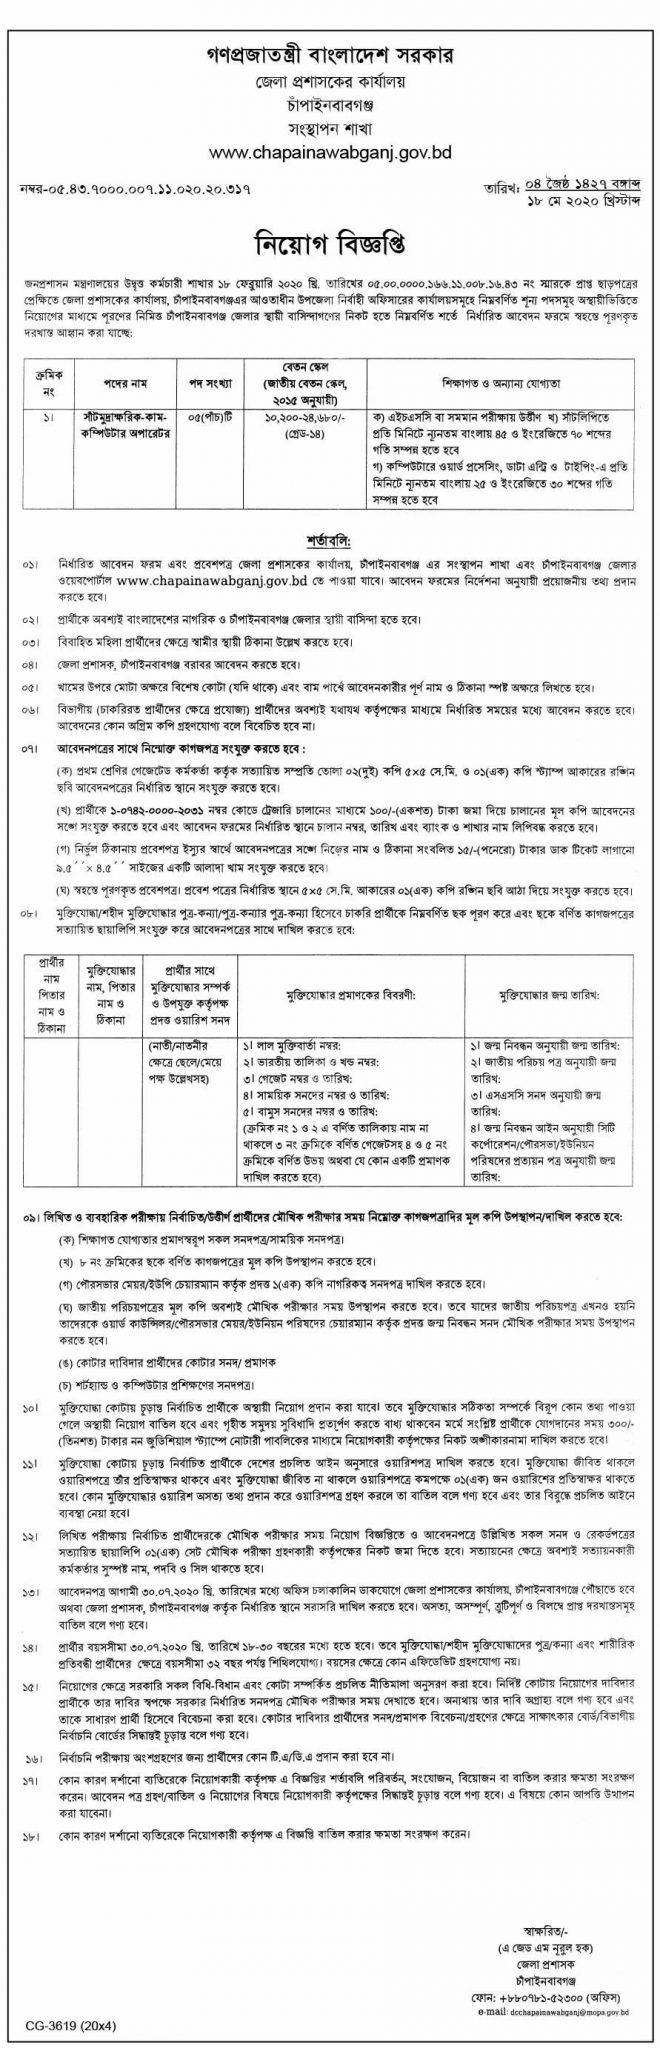 Chapainawabganj DC Office Job Circular